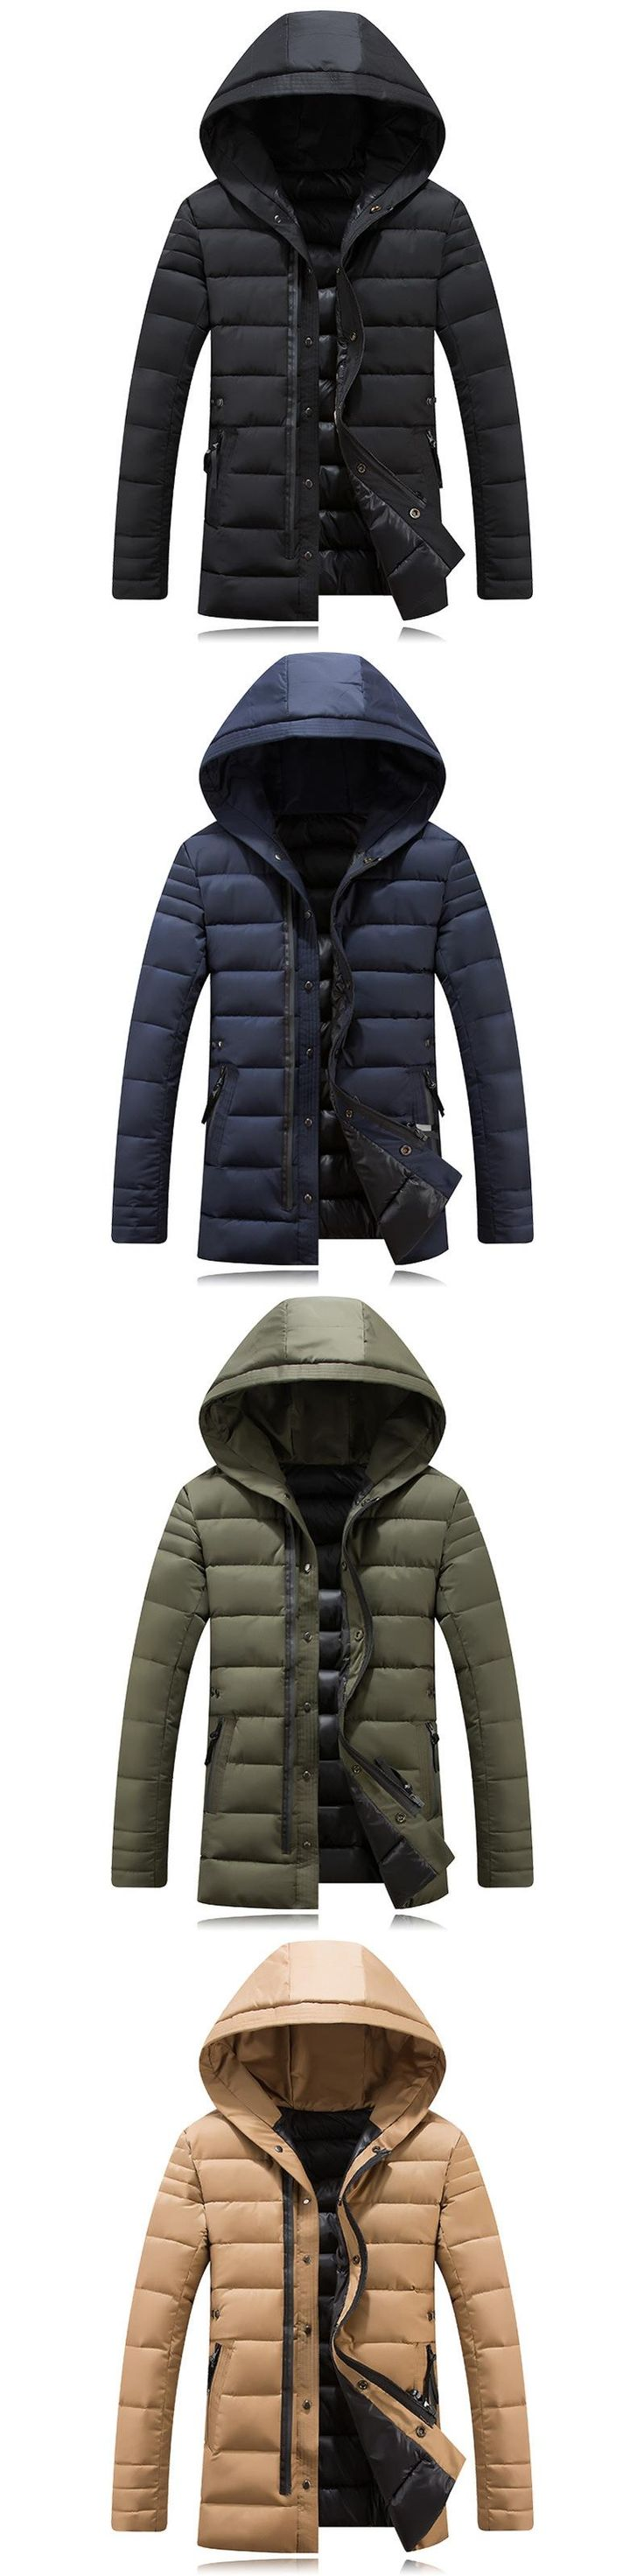 Port&Lotus Winter Men Coats with Hat Brand New Warm Camperas Hombre 2016 Invierno Parka Men 062 Jaqueta Masculina